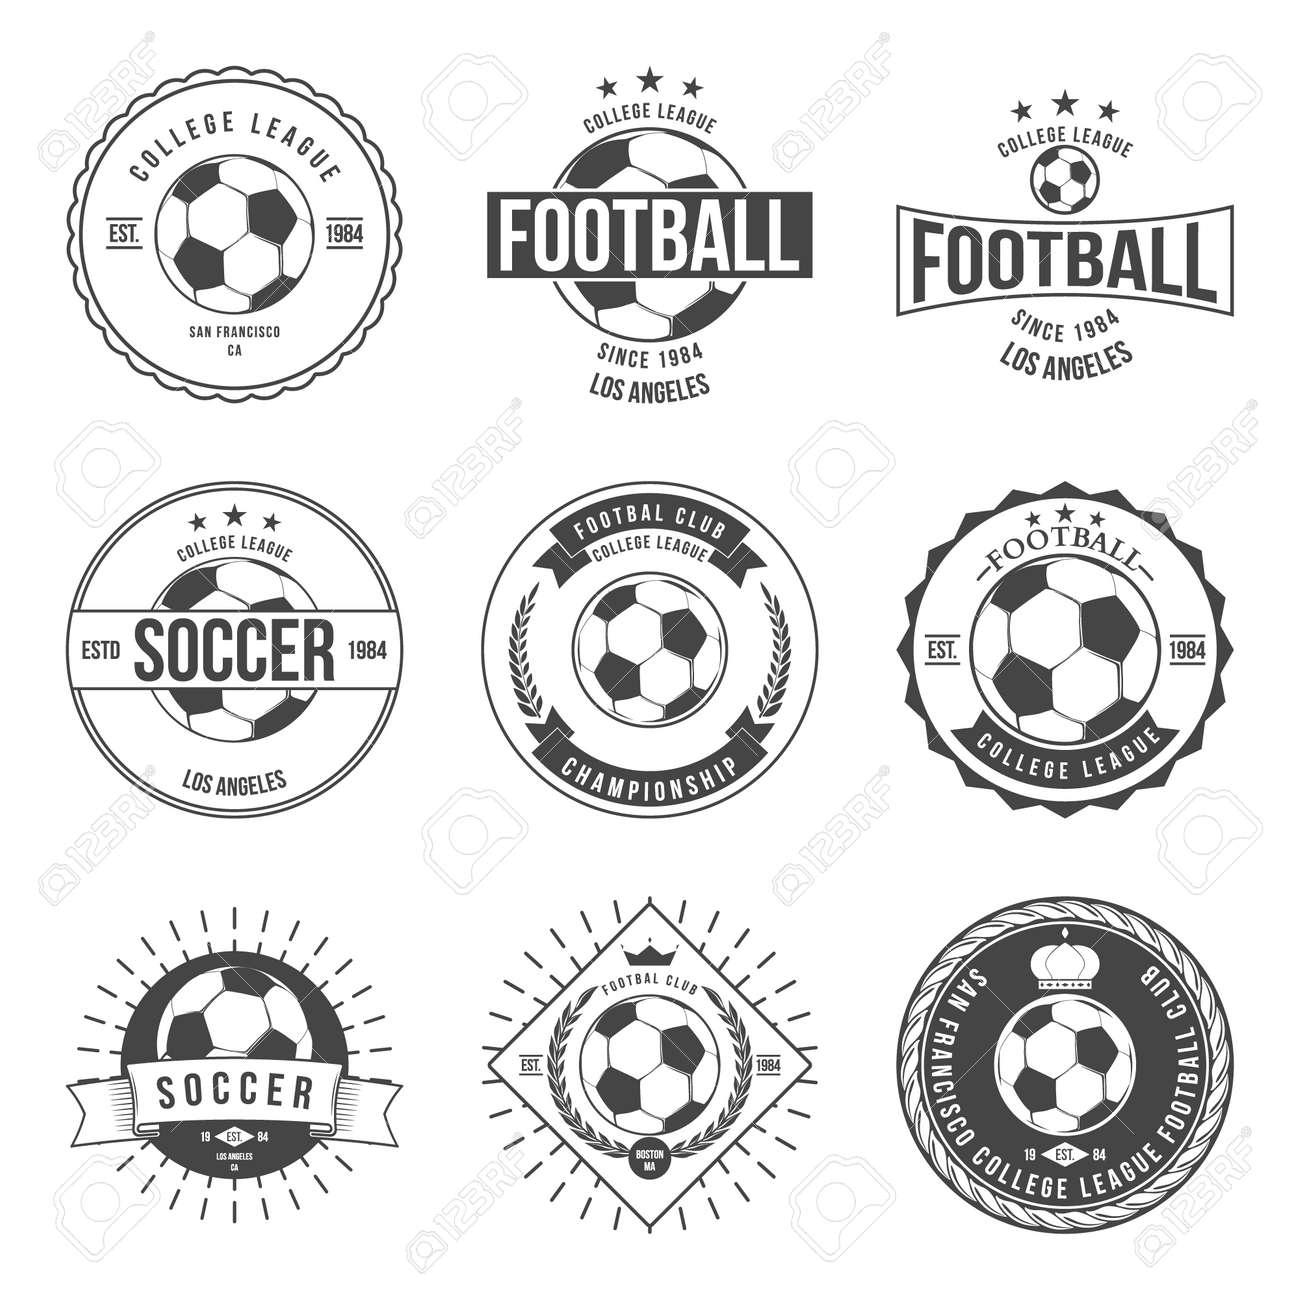 Soccer Football Typography Badge Design Element vector - 42460330